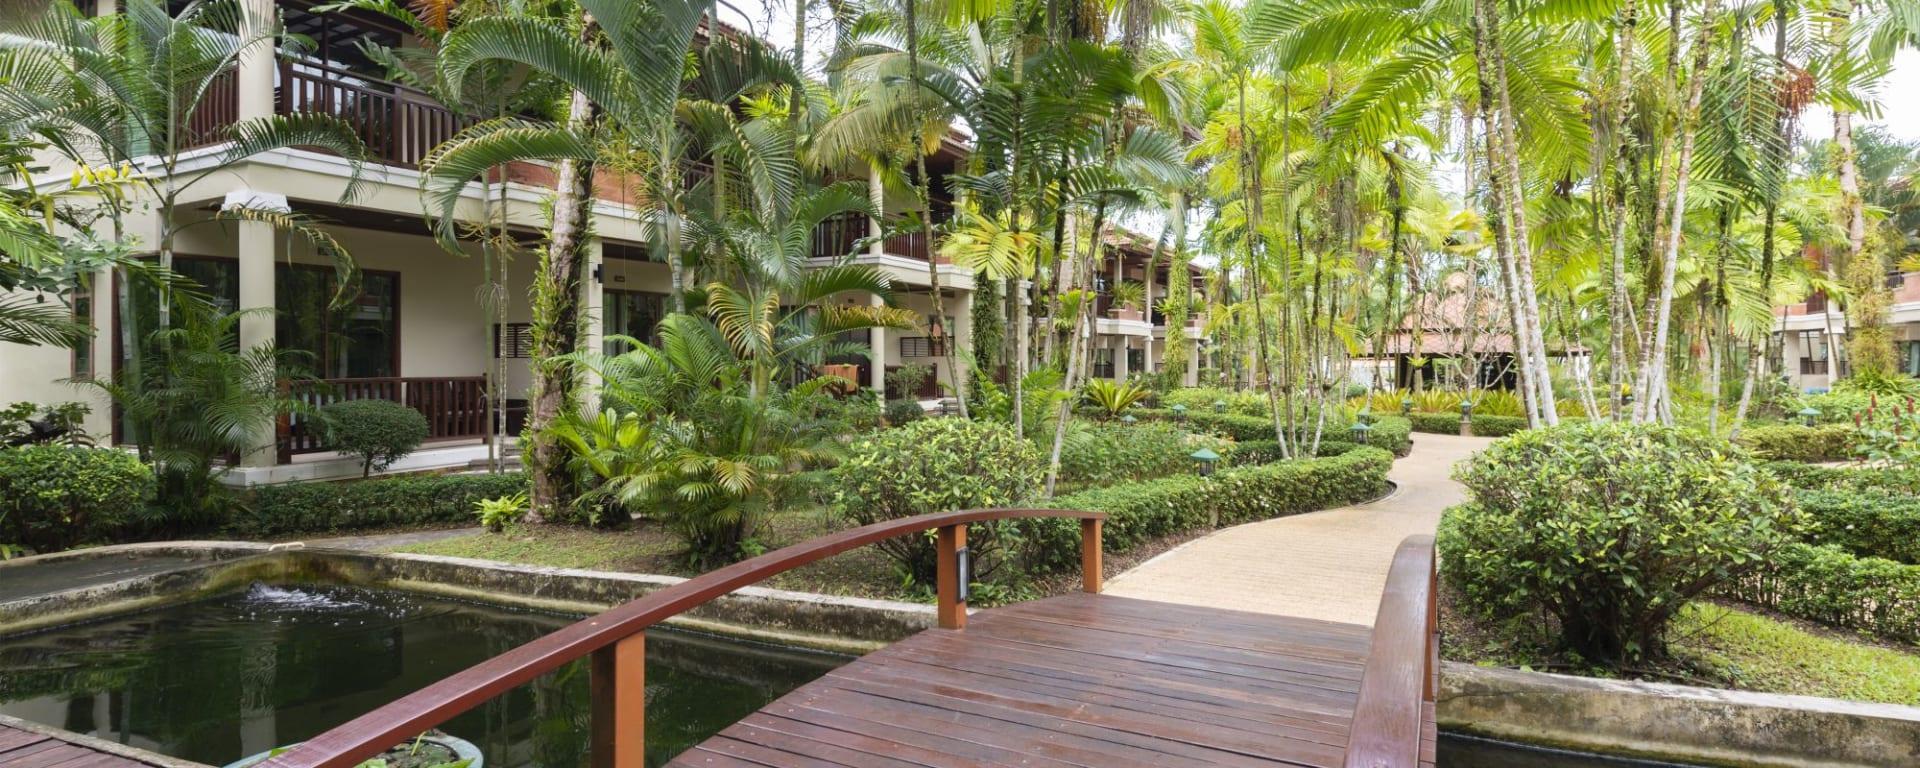 Khao Lak Bayfront Resort: garden